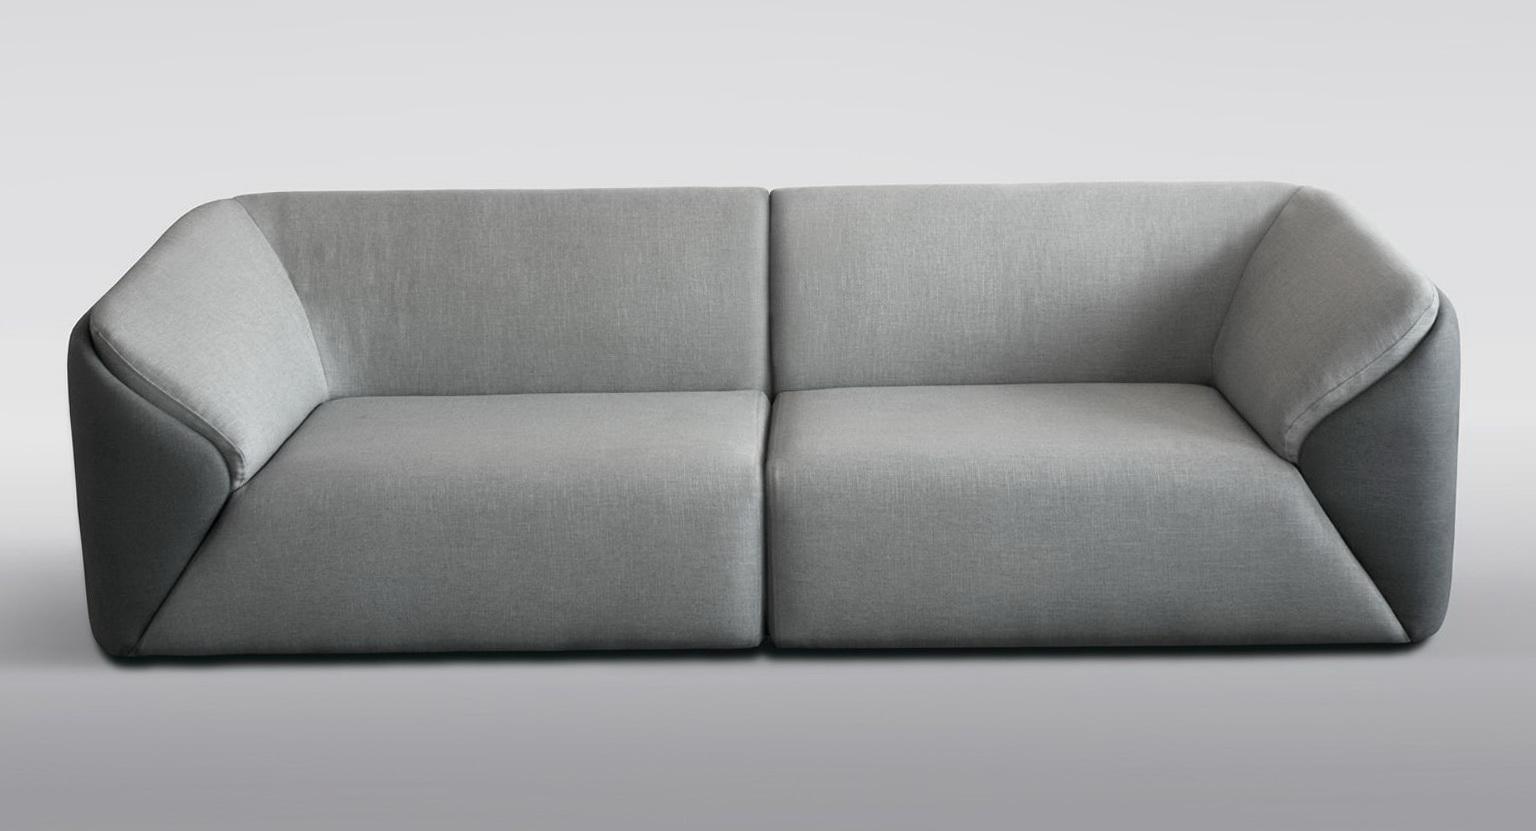 Grey Modern Sofa Bed